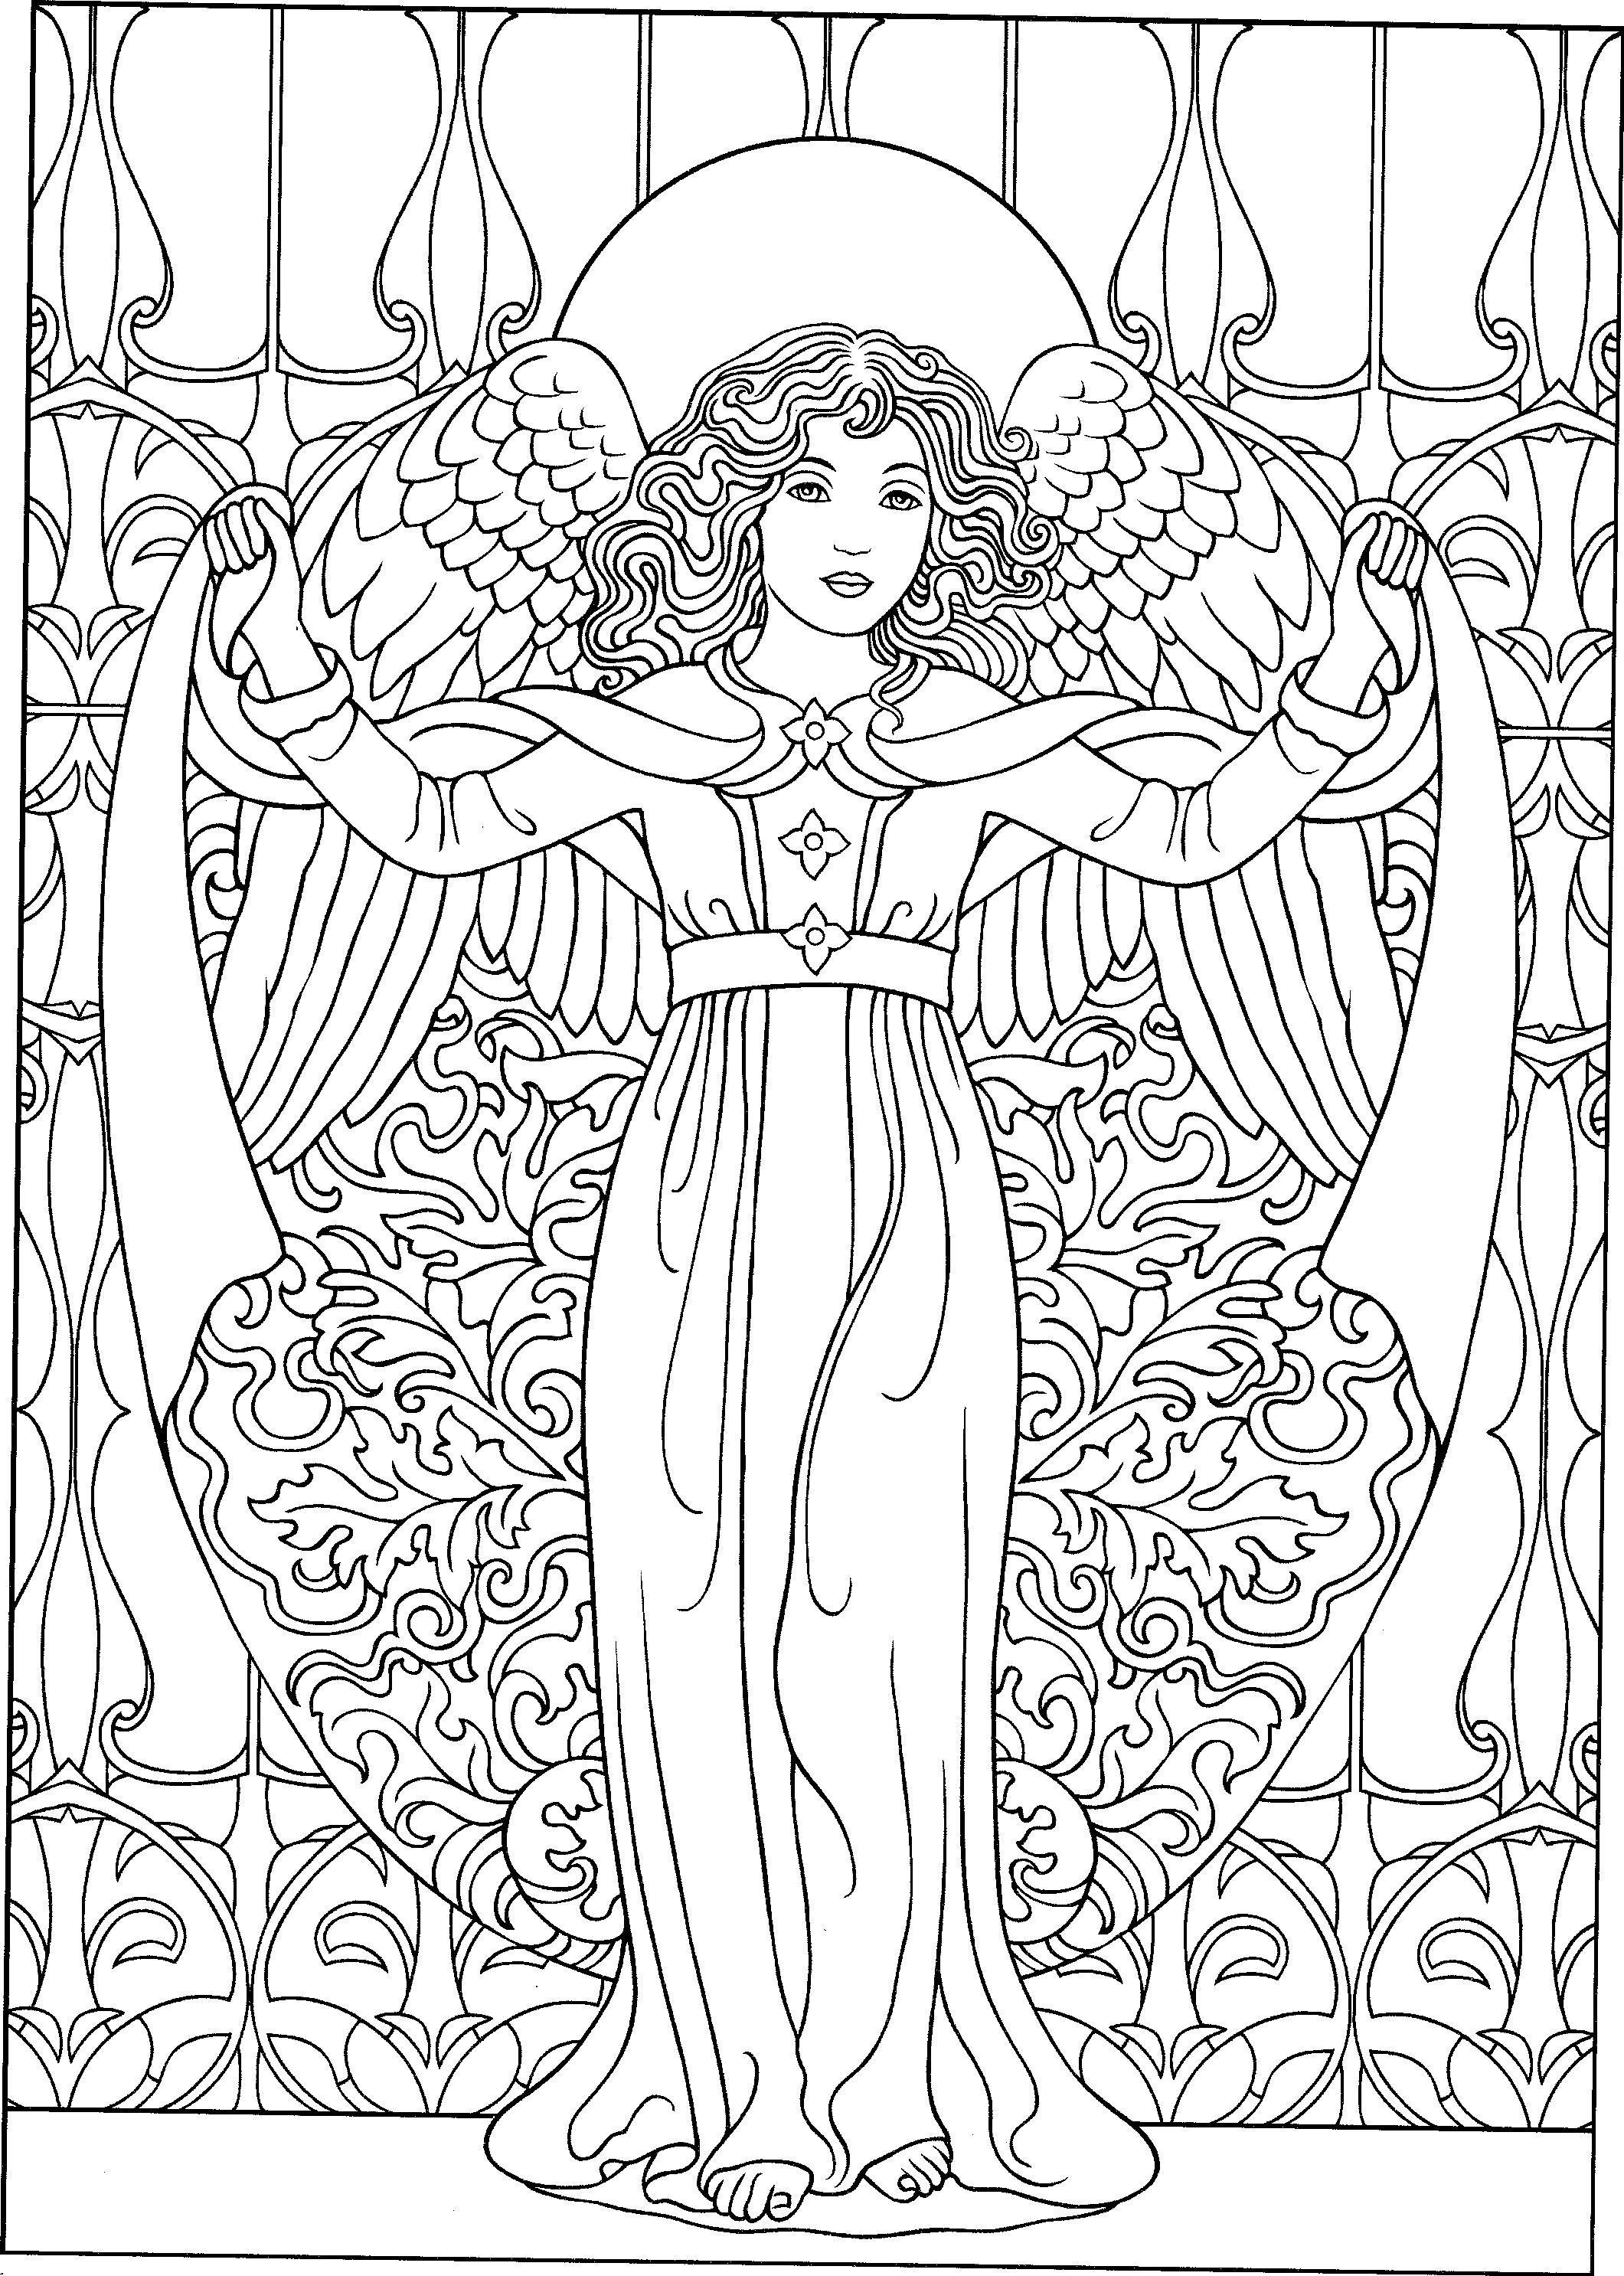 Pin By Jennifer D On Art I Like Angel Coloring Pages Fairy Coloring Pages Abstract Coloring Pages